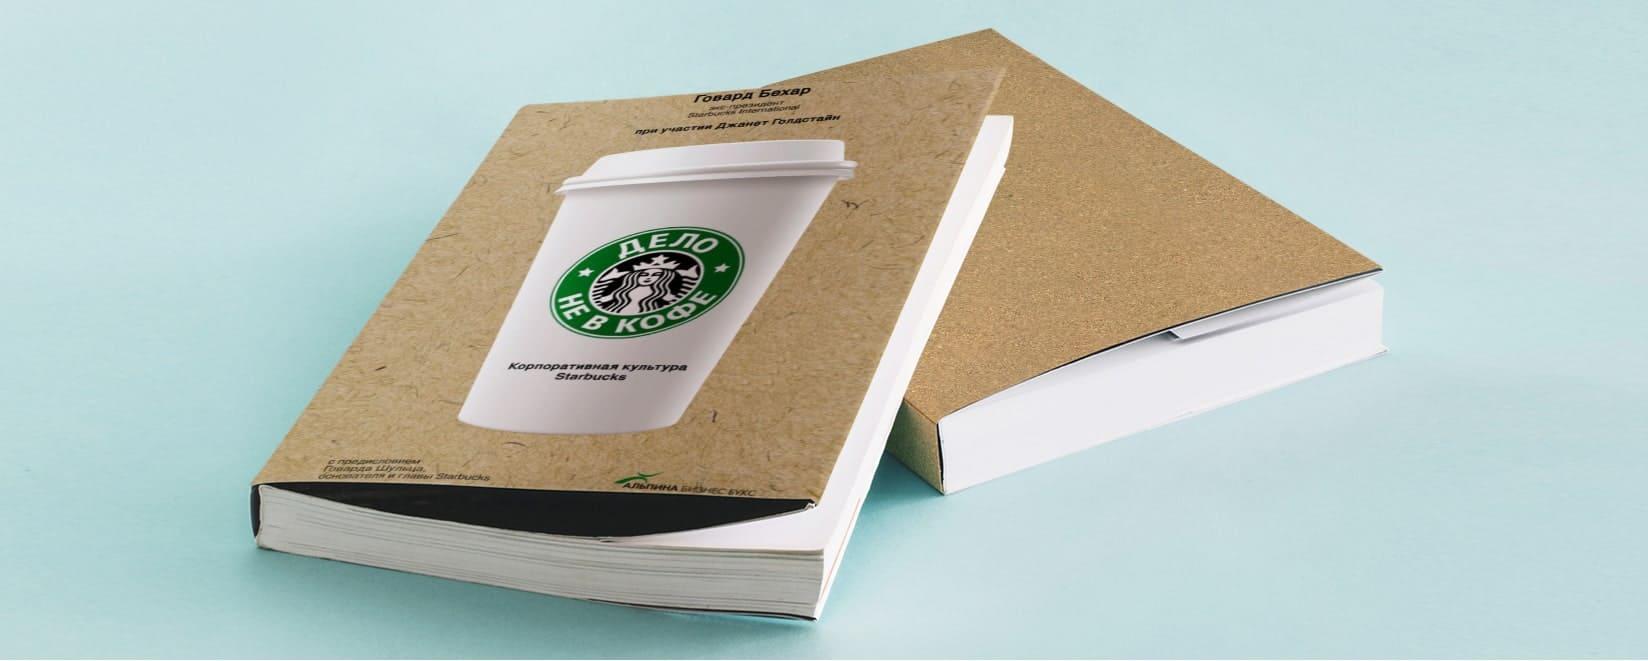 Hurma Blog: Дело не в кофе. Корпоративная культура Starbucks